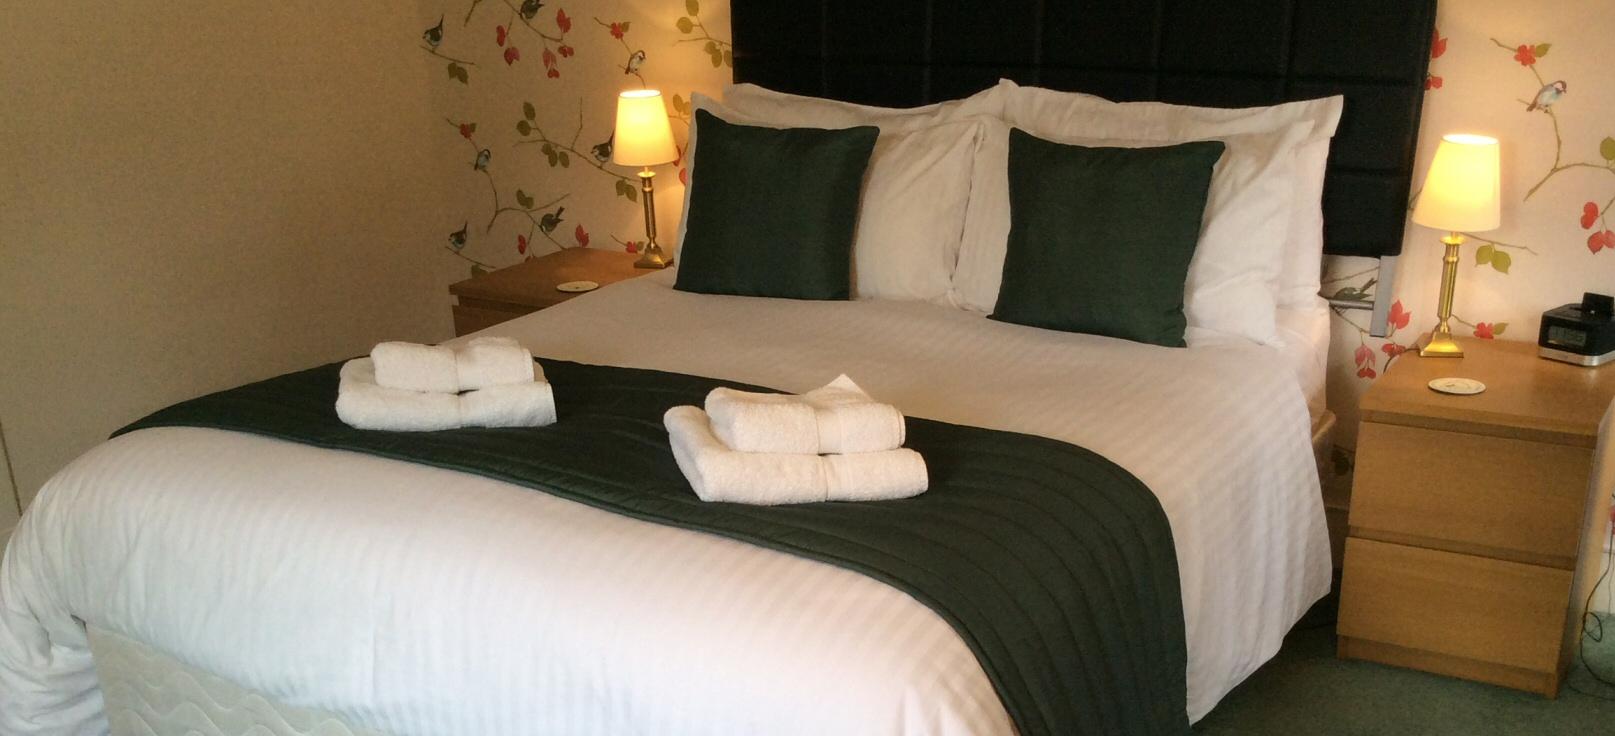 <h2>Craiglea Bed and Breakfast  - Braemar</h2><div class='slide-content'></div>